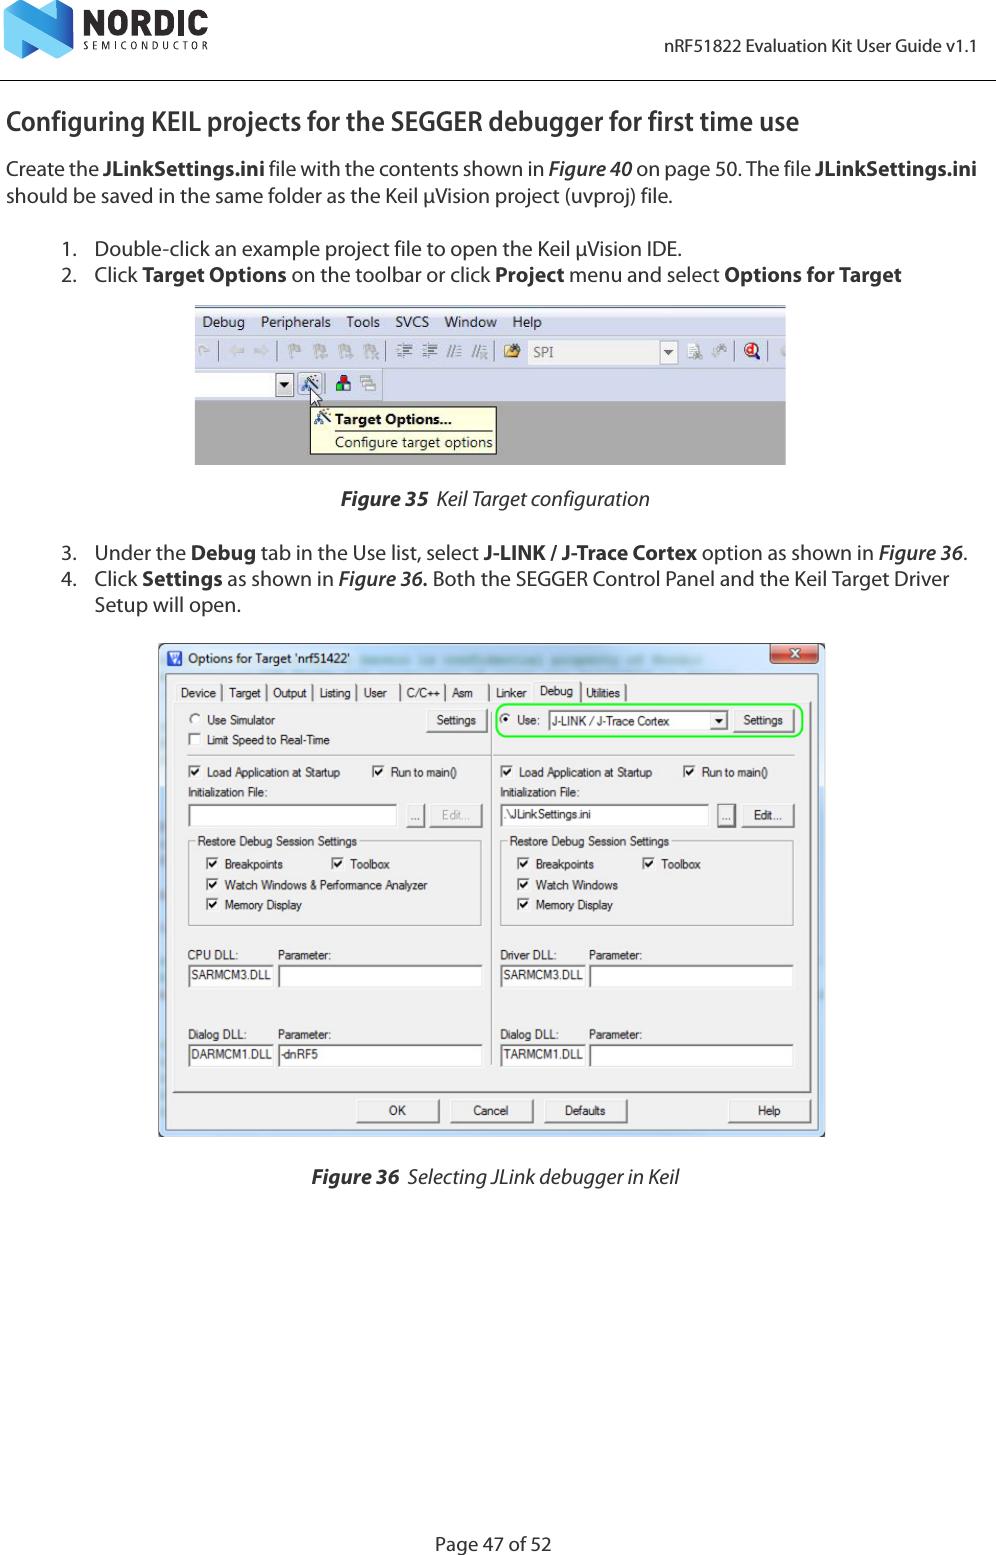 NRF51822_422_Eval_Kit User Guide N RF51822 Evaluation Kit V1 1